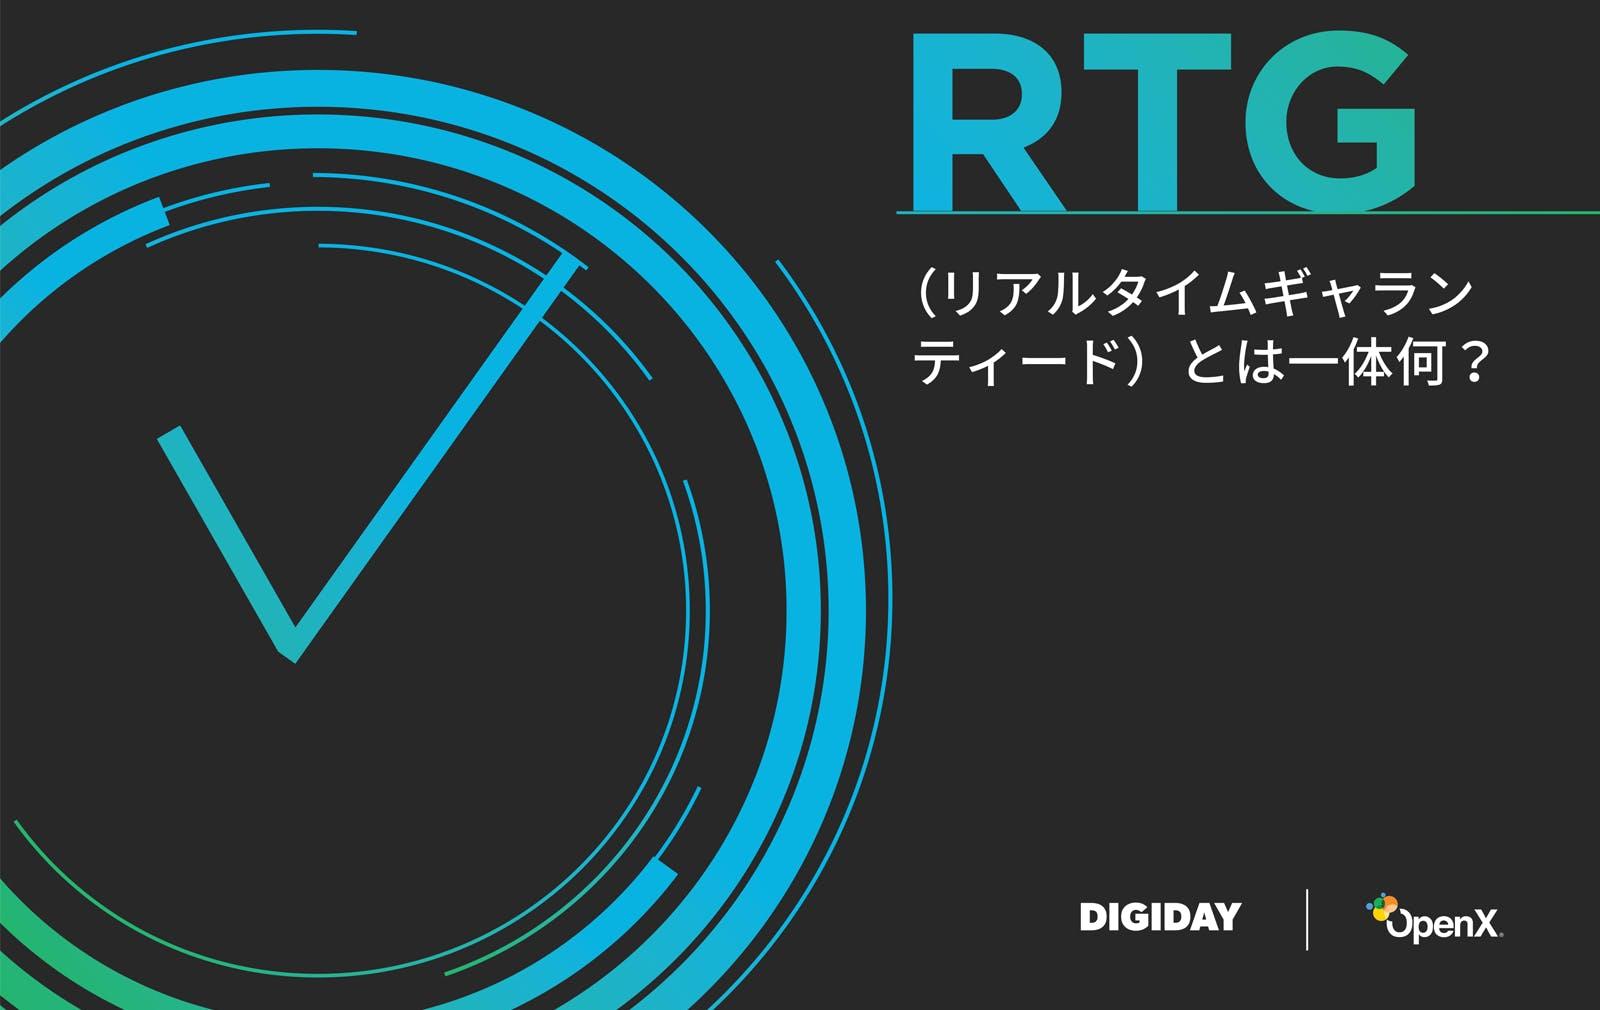 WTF RTG JP FeatImg - OpenX プログラマティックダイレクト:RTG